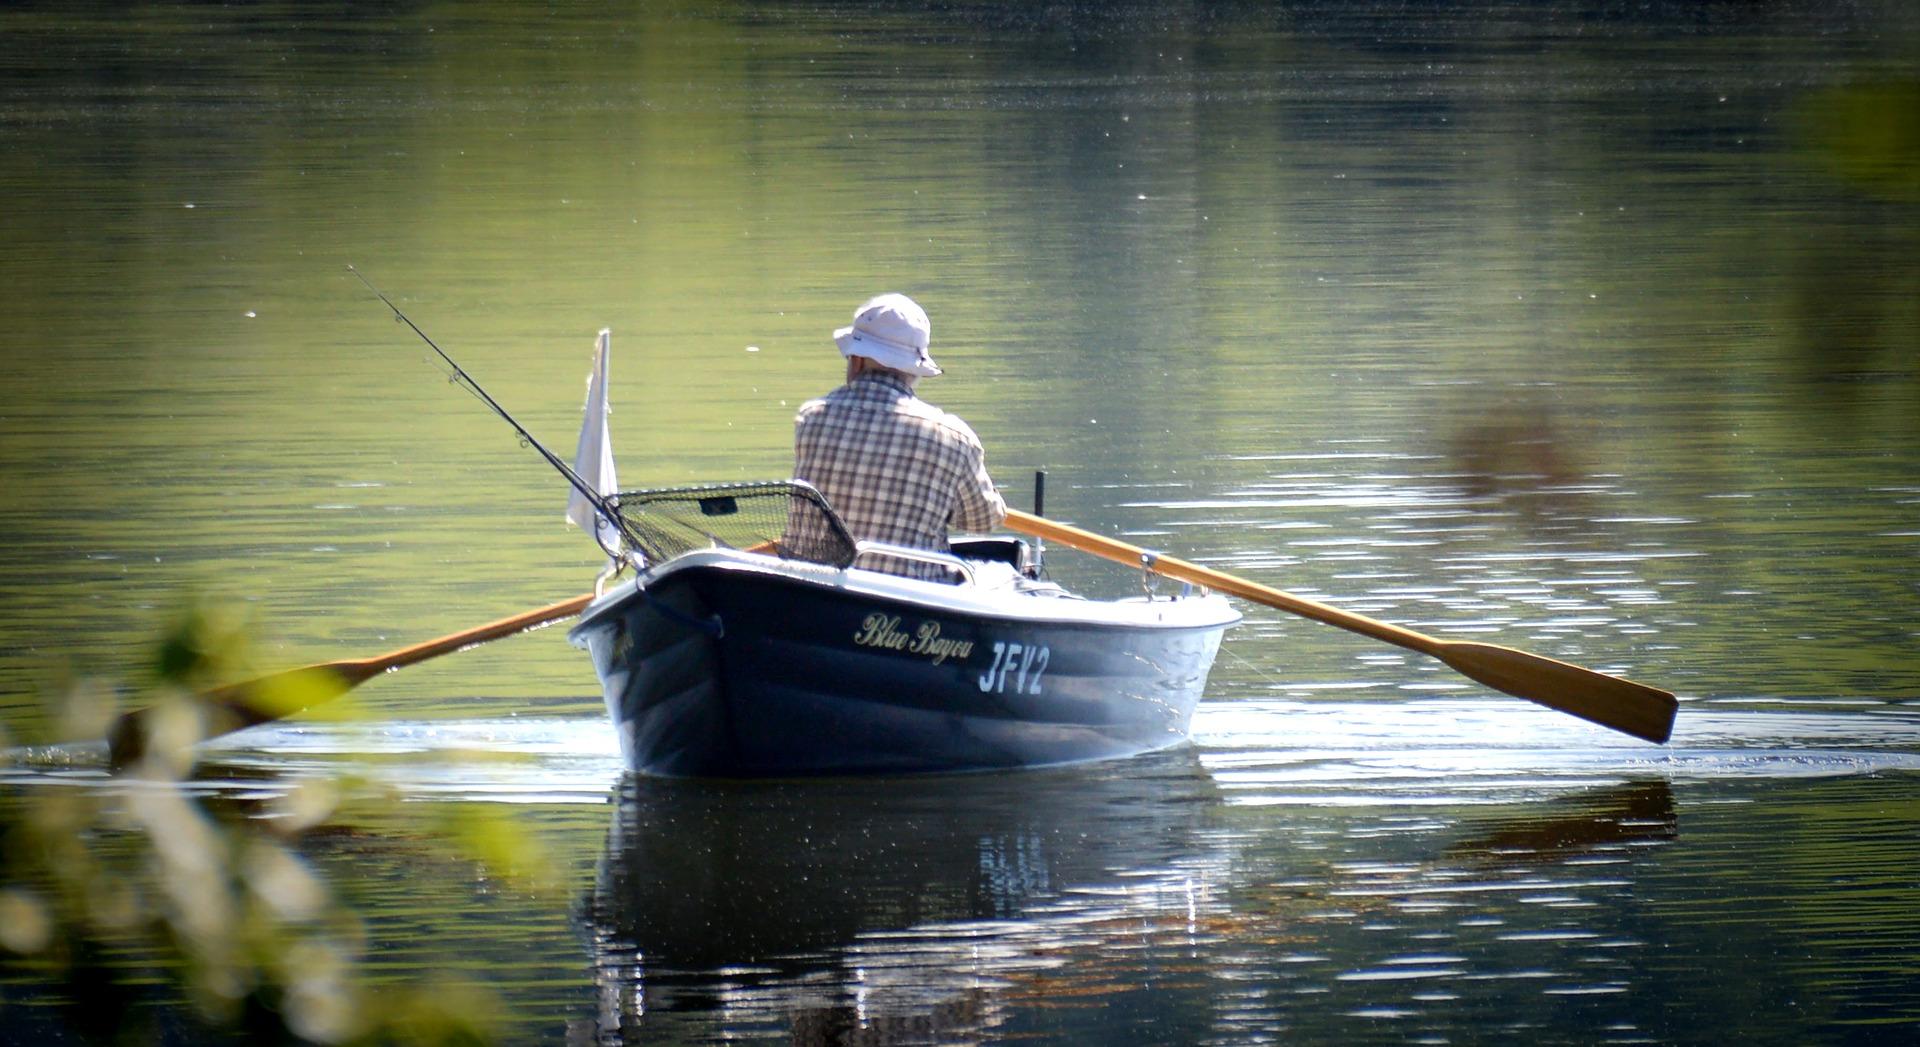 rower-1926440_1920